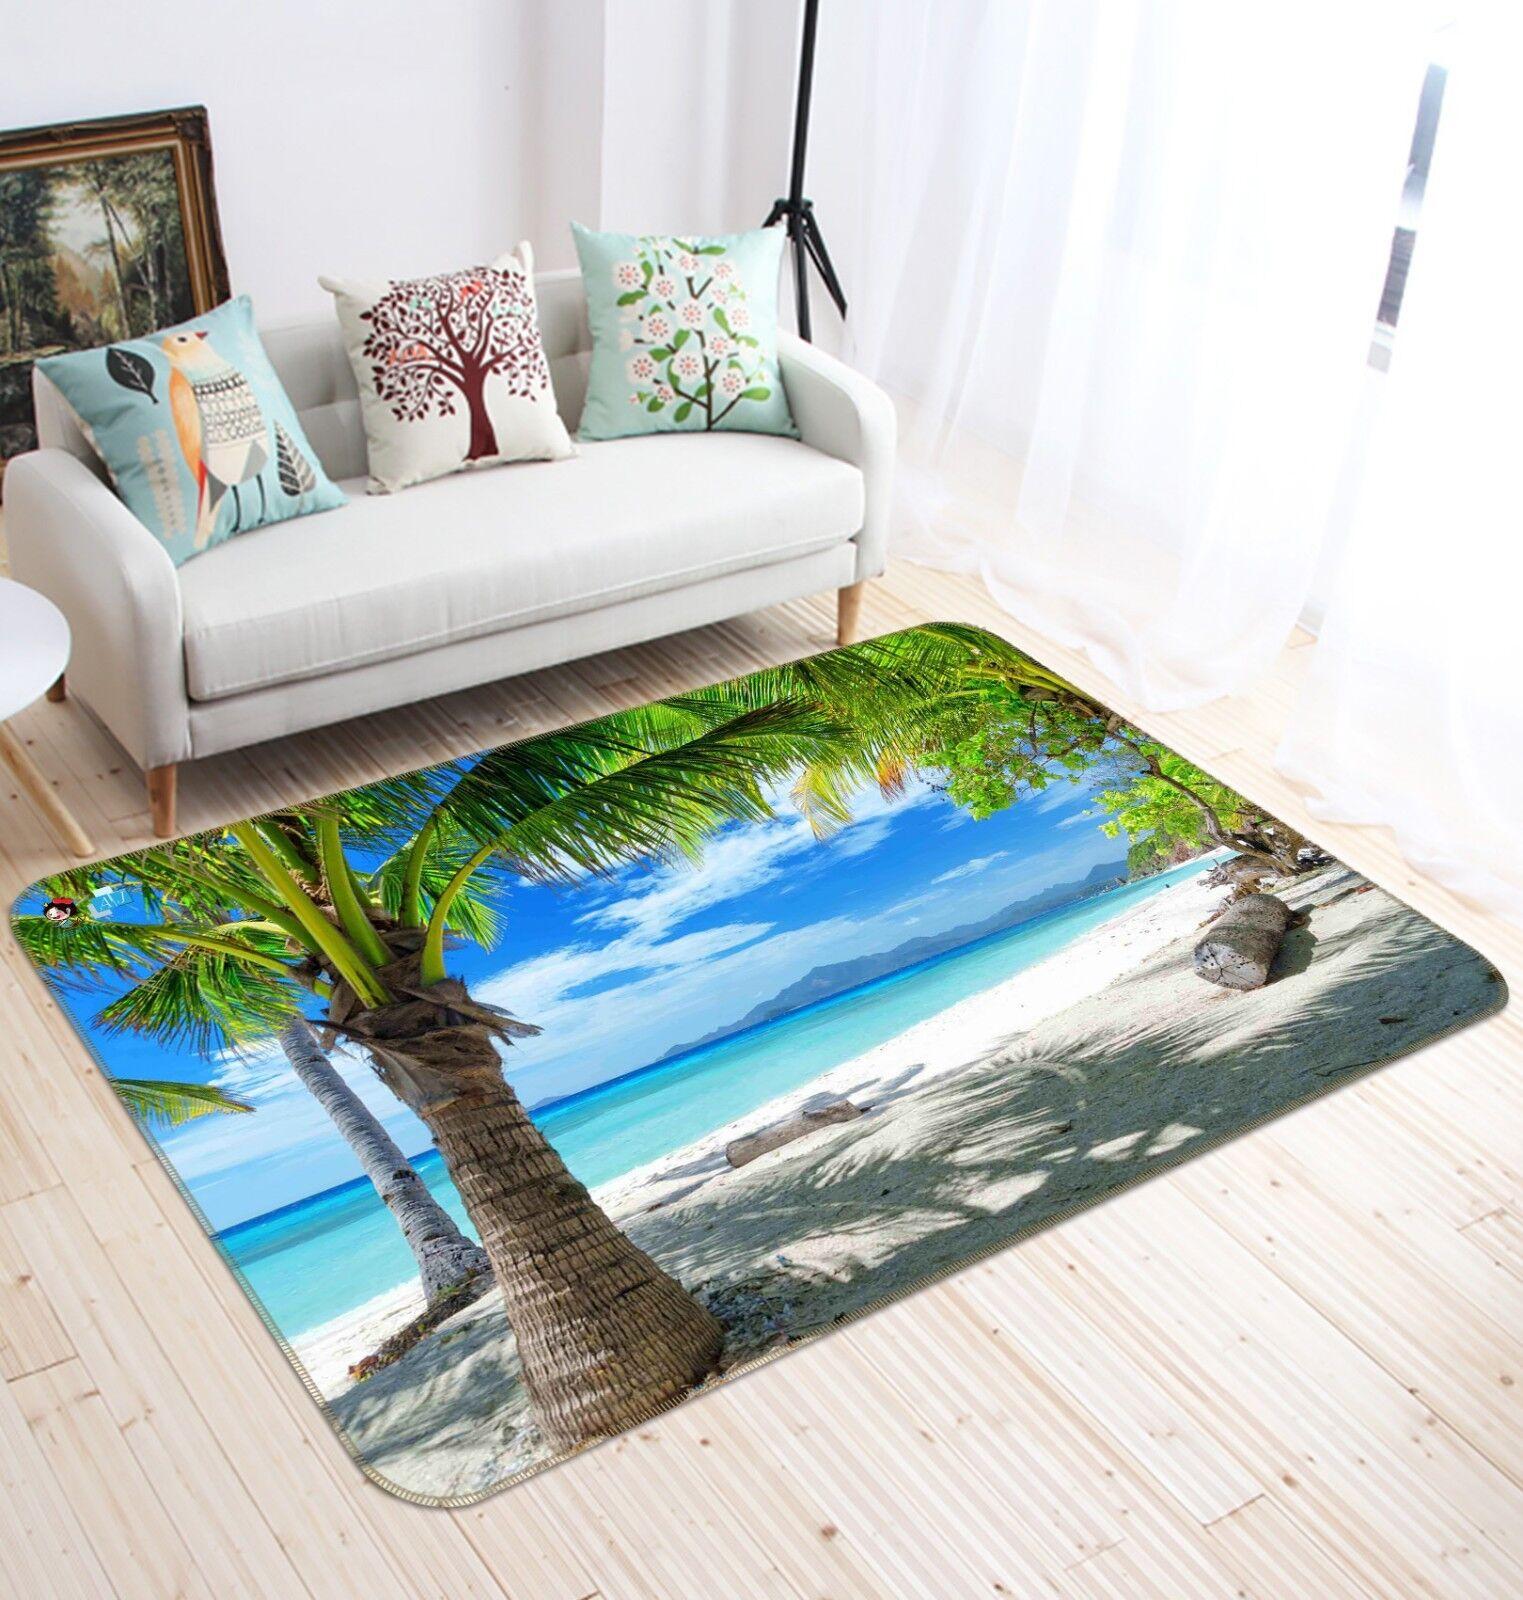 Sunny Playa 3D 05 Alfombra Colchoneta Antideslizante Alfombra De Sala Elegante De Calidad Foto Alfombra Reino Unido Cobb